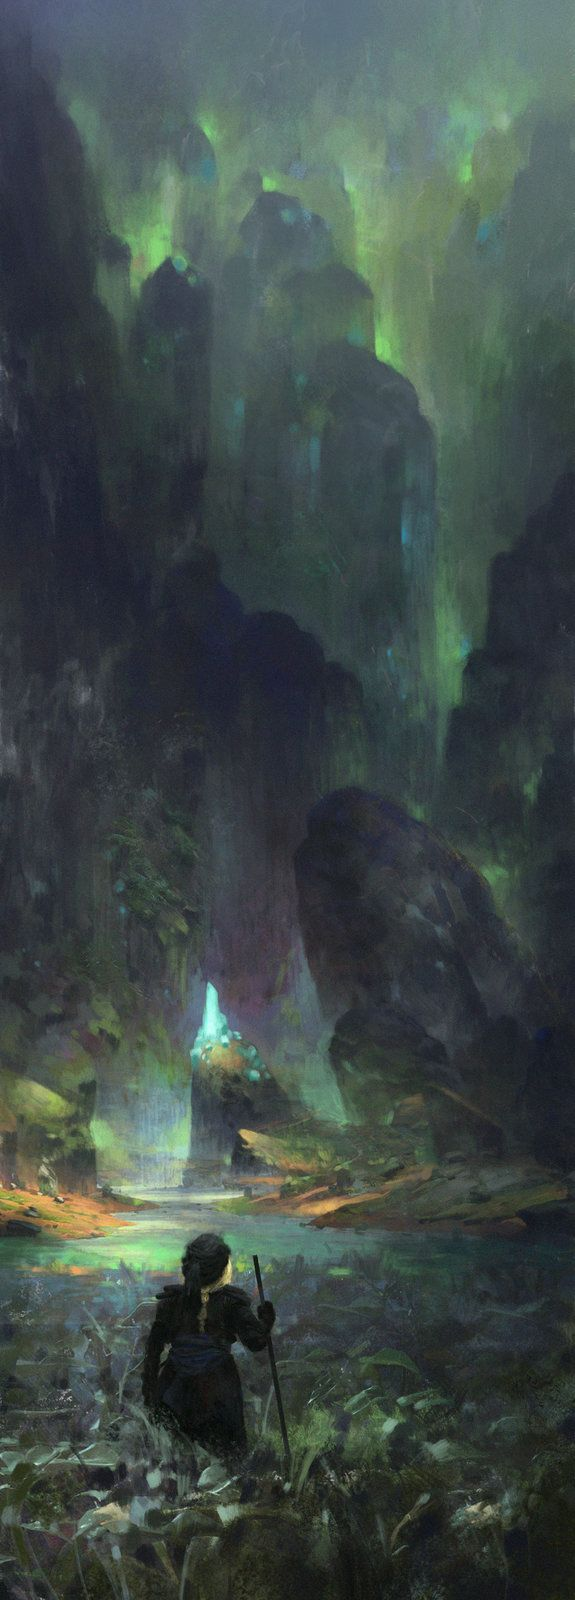 Magic Cave, Max Bedulenko on ArtStation at https://www.artstation.com/artwork/magic-cave-183bb71a-4936-4cea-99b0-b5bd79c741e7